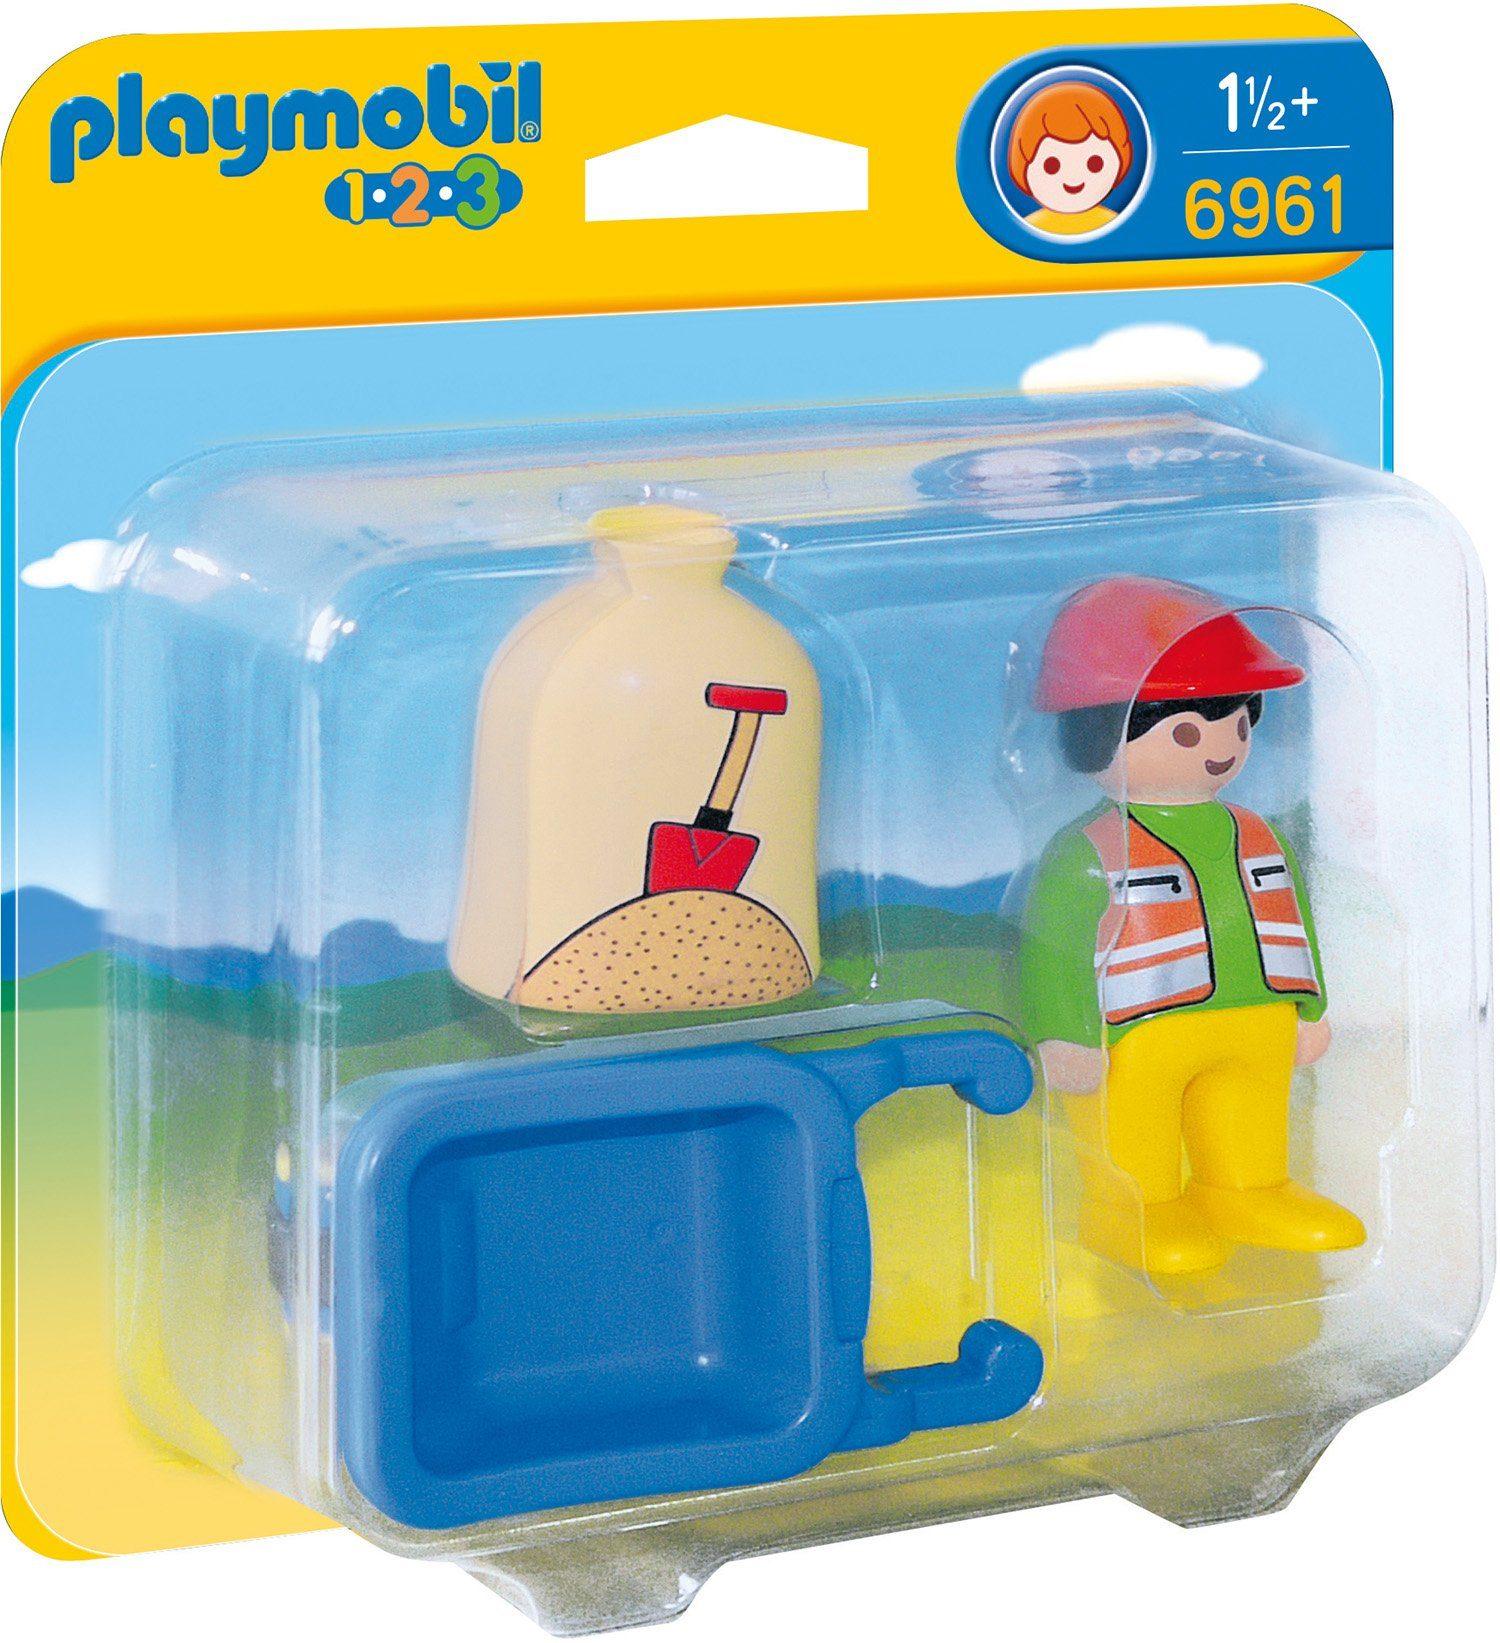 Playmobil® Bauarbeiter mit Schubkarre (6961), »Playmobil 1-2-3«